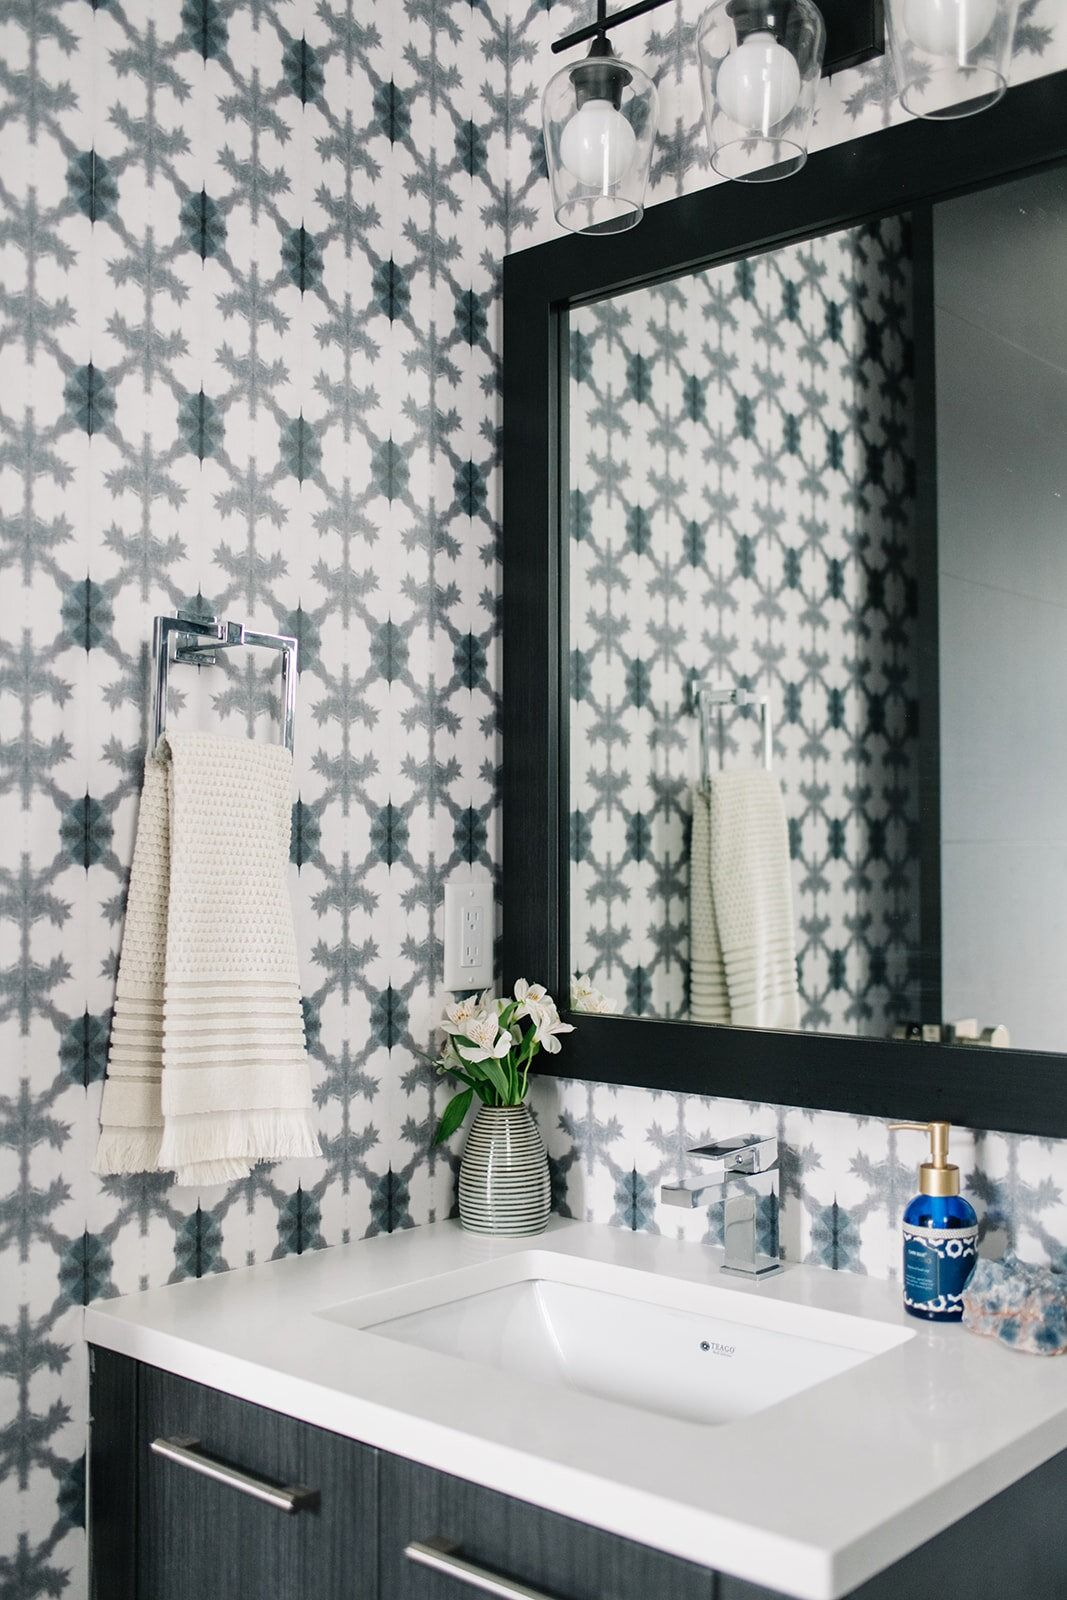 Pineapple Wallpaper Stunning Gray Shibori Wallpaper Milton King Bathroom Interior Design Bathroom Design Inspiration Pineapple Wallpaper